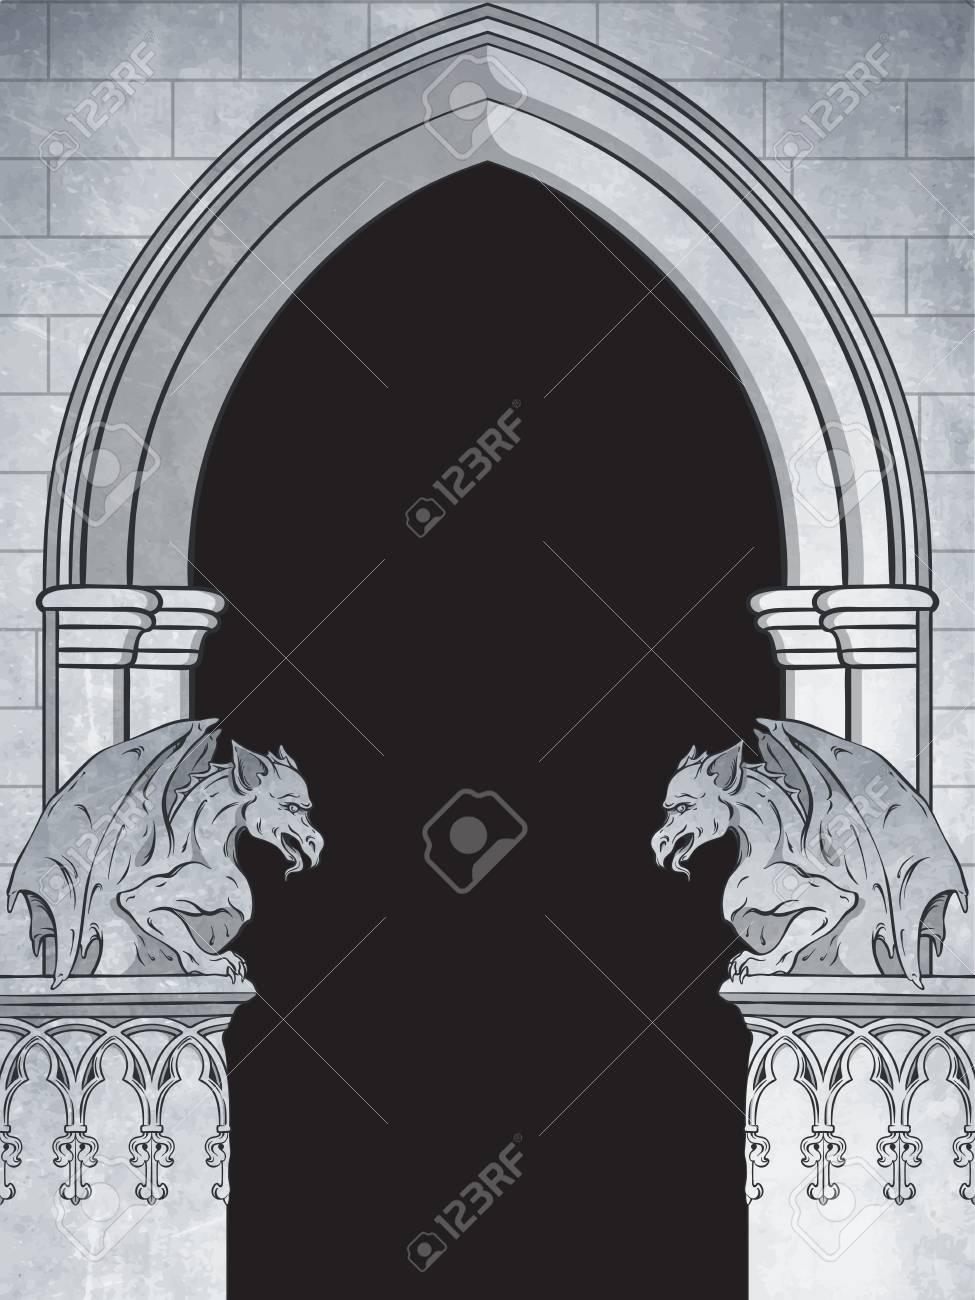 Gothic arch with gargoyles hand drawn vector illustration. Frame or print design. - 89979366